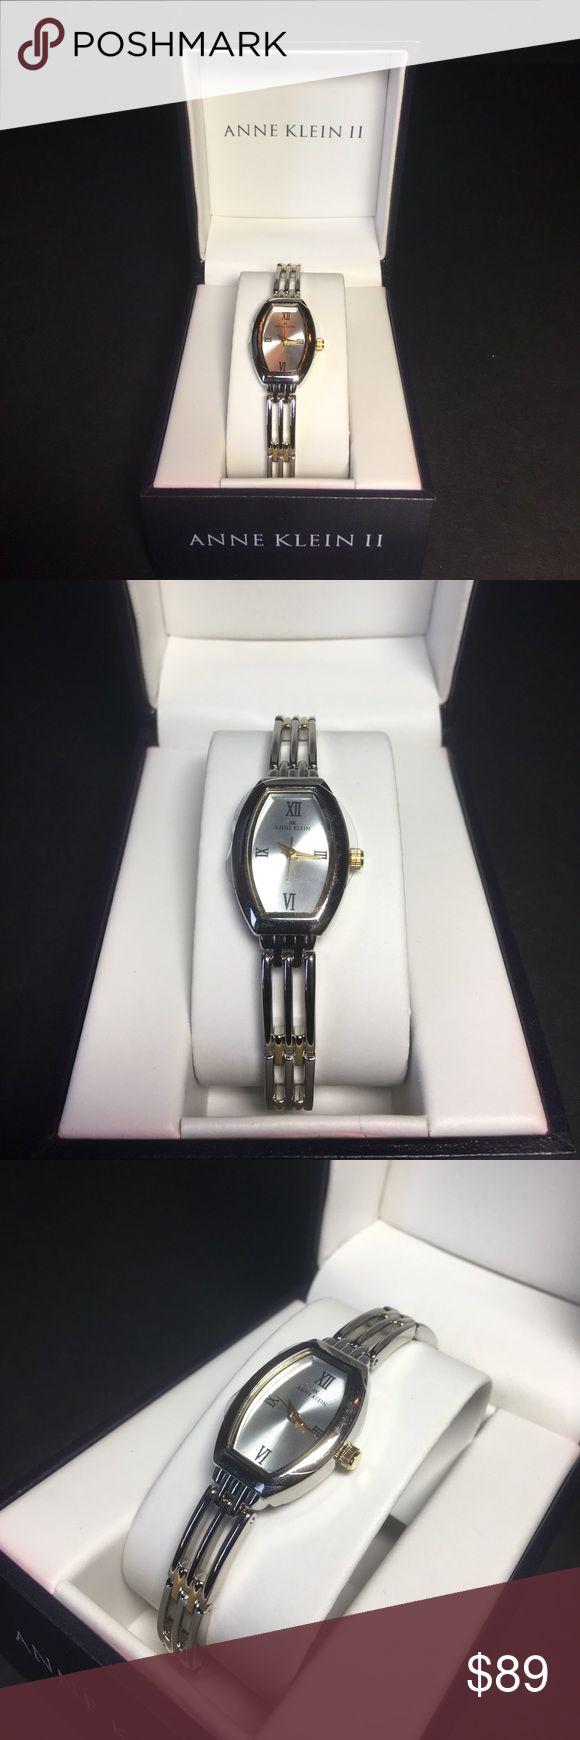 New Anne Klein ll Y121E Woman's Wrist Watch New Anne Klein ll Y121E Woman's Wrist Watch Anne Klein Accessories Watches